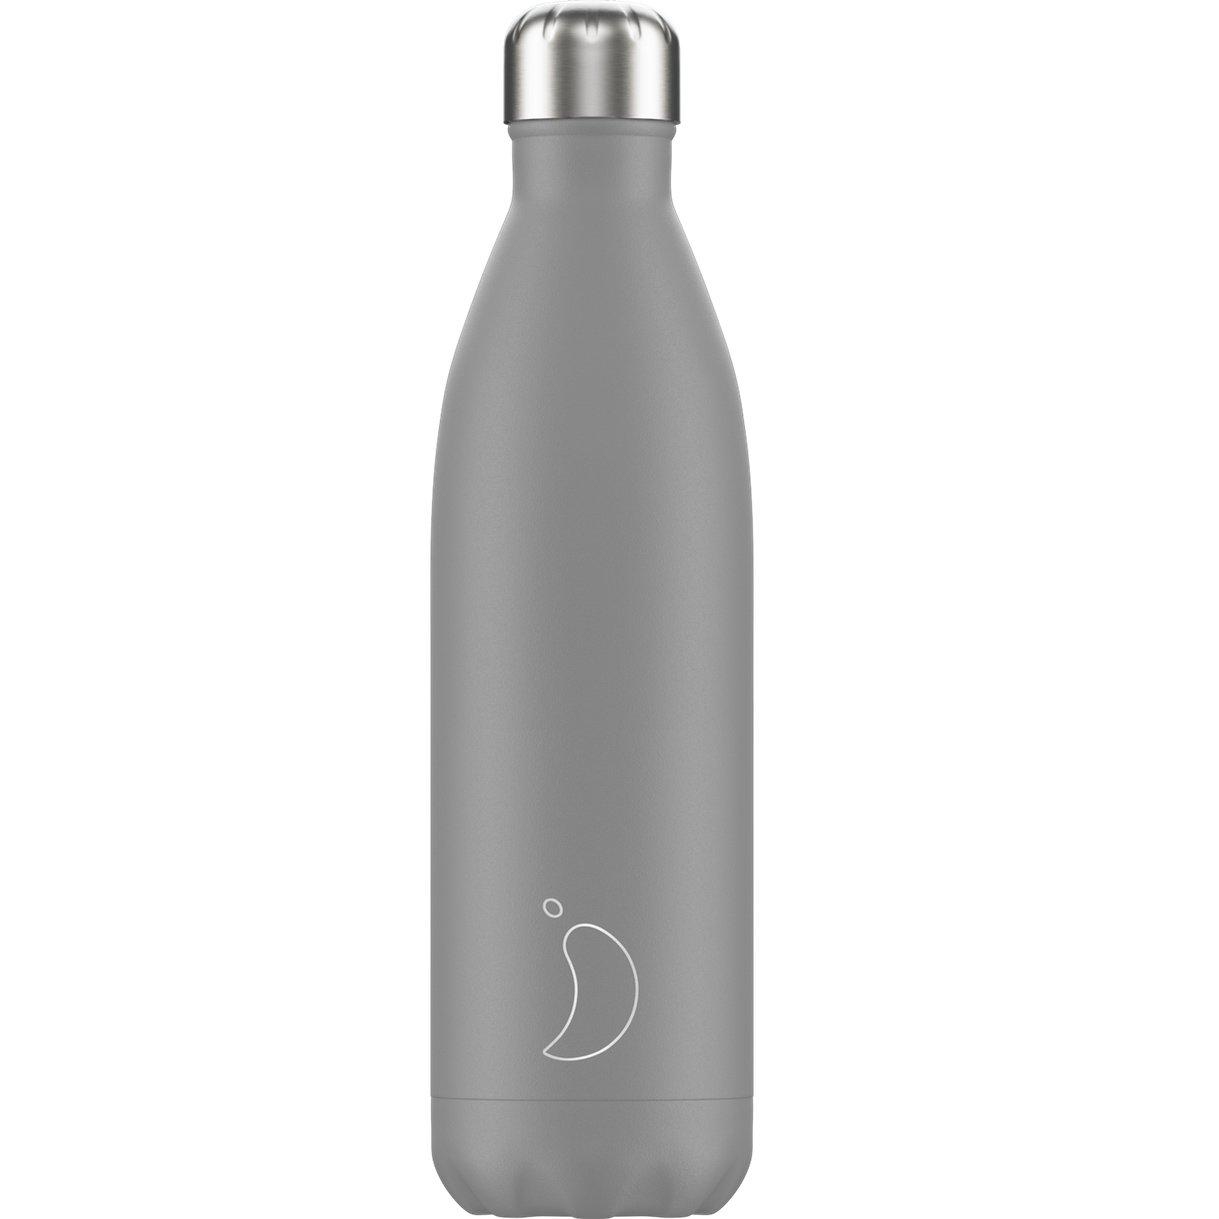 Chilly's Bottle Ανοξείδωτο Θερμός 750ml – Grey Monochrome